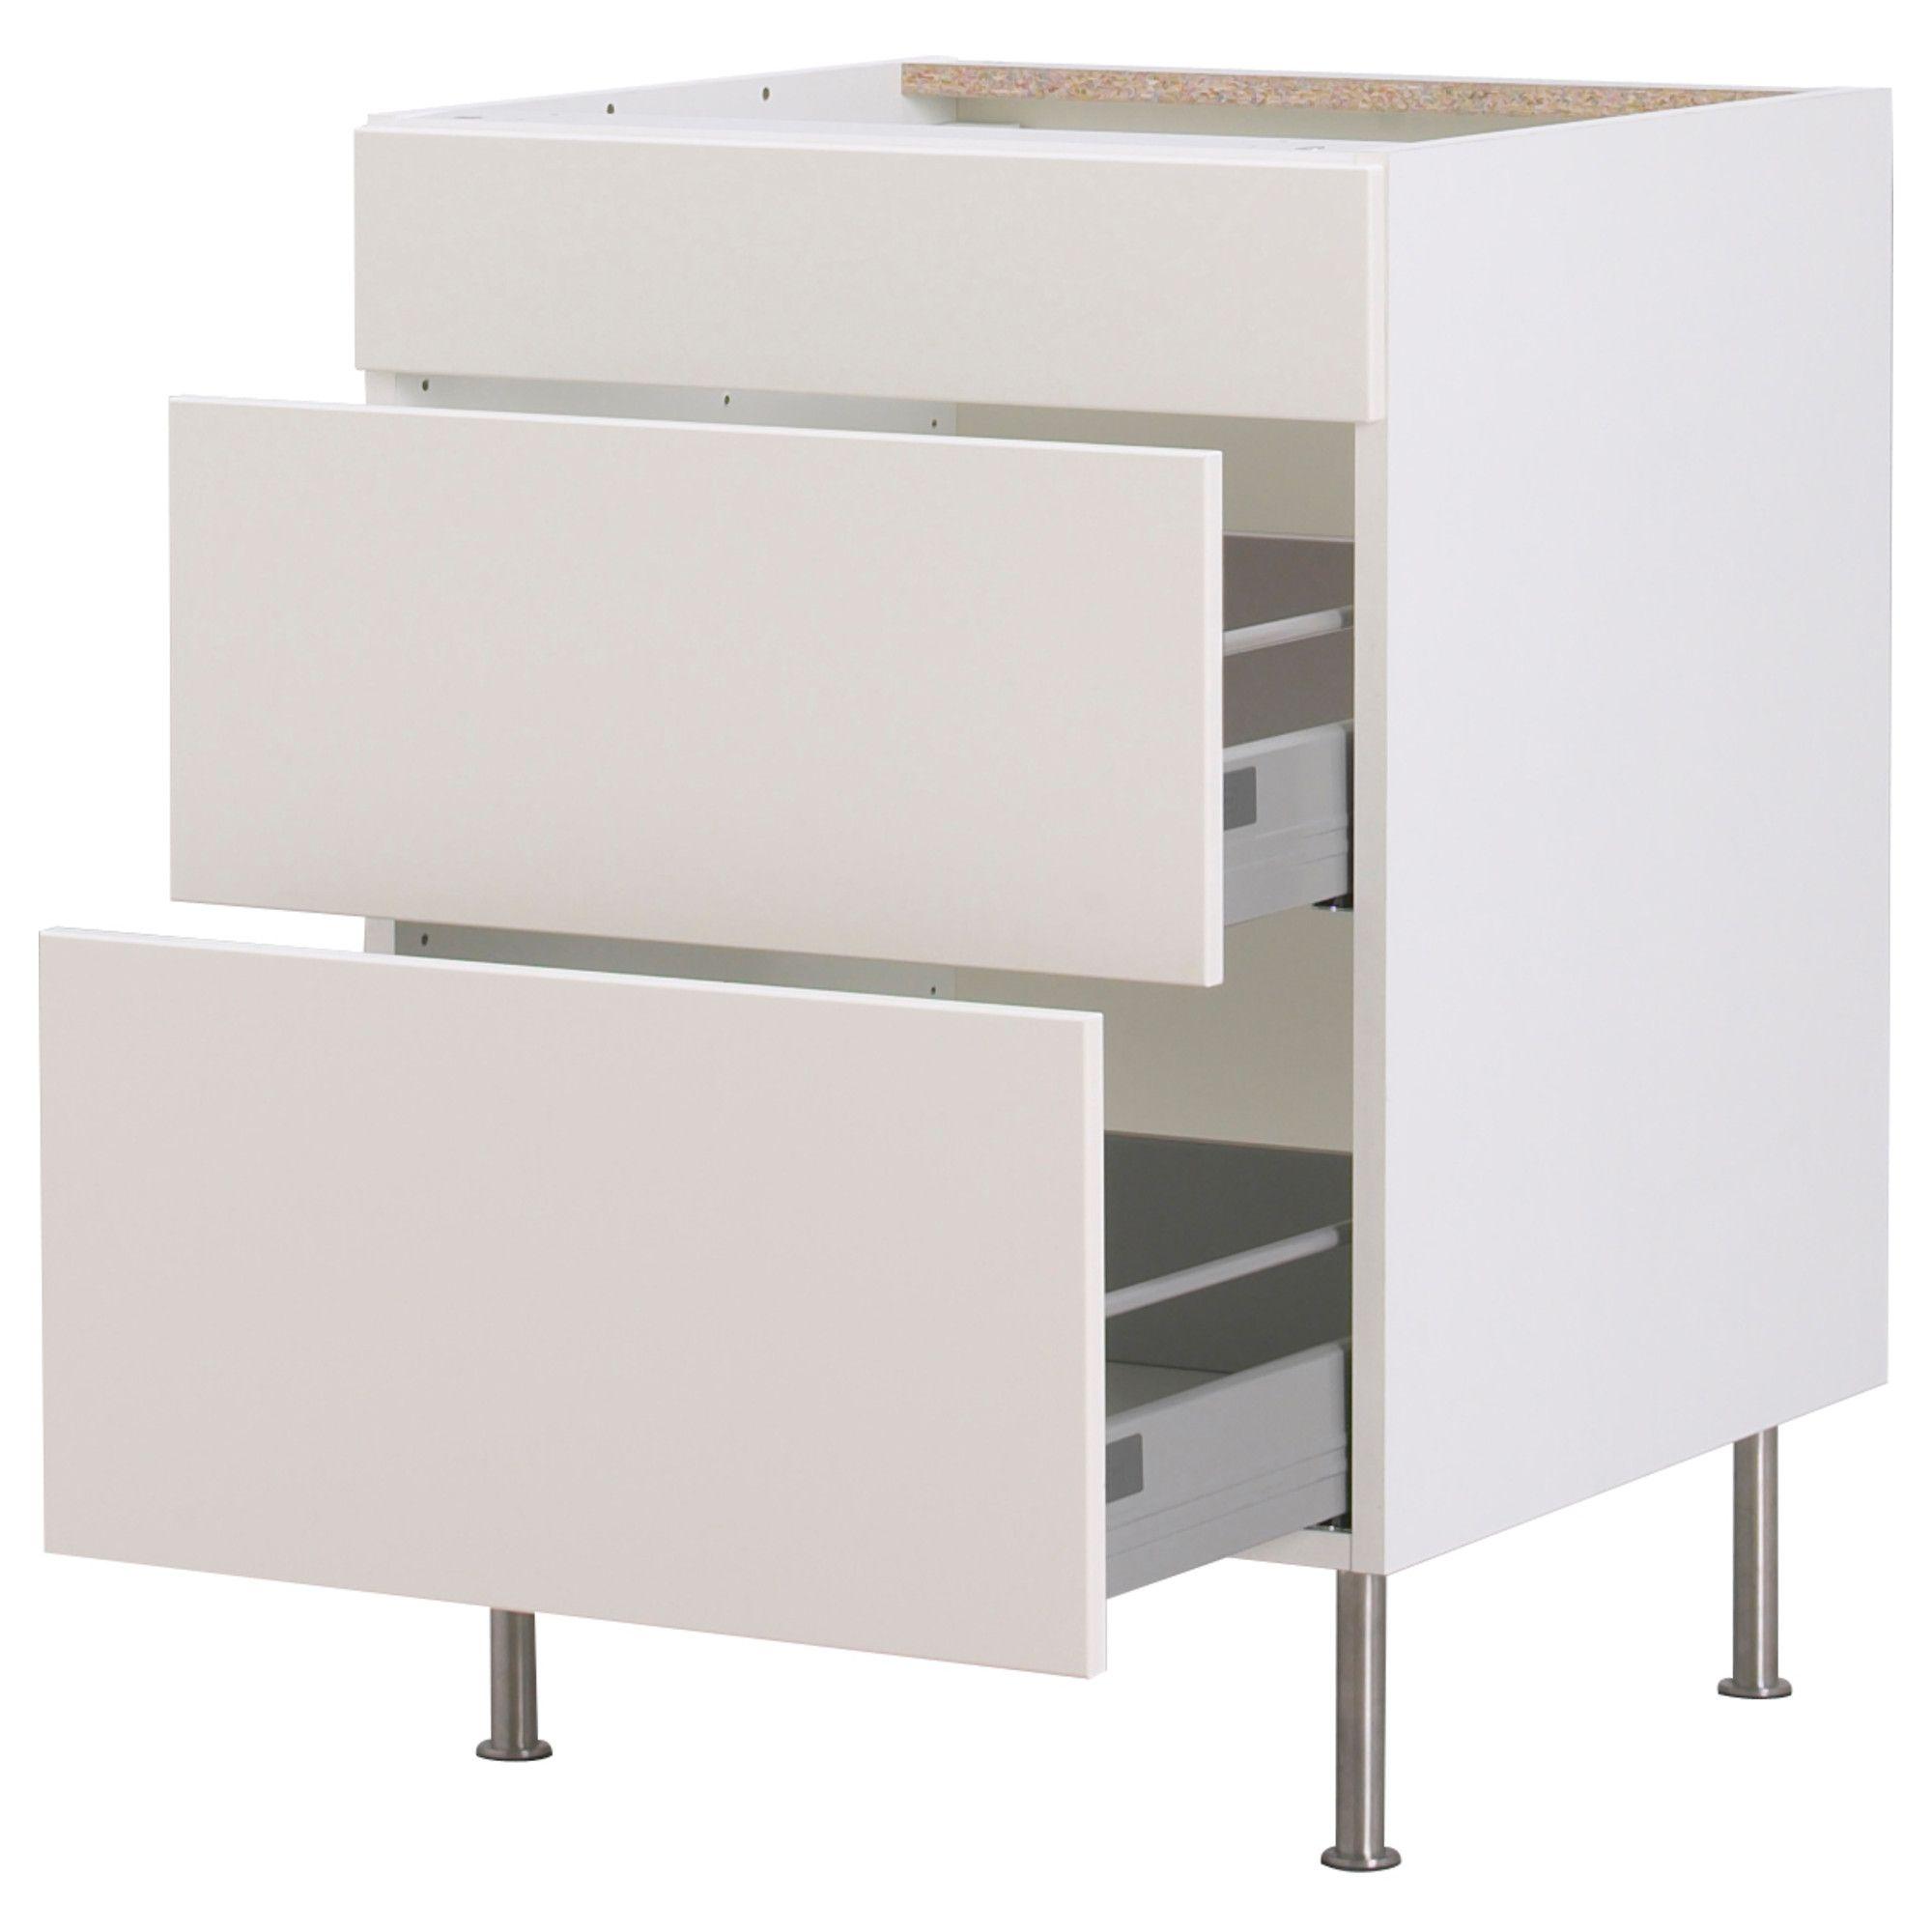 Interior Akurum Base Cabinet akurum base cabinet with 3 drawers white 18 ikea